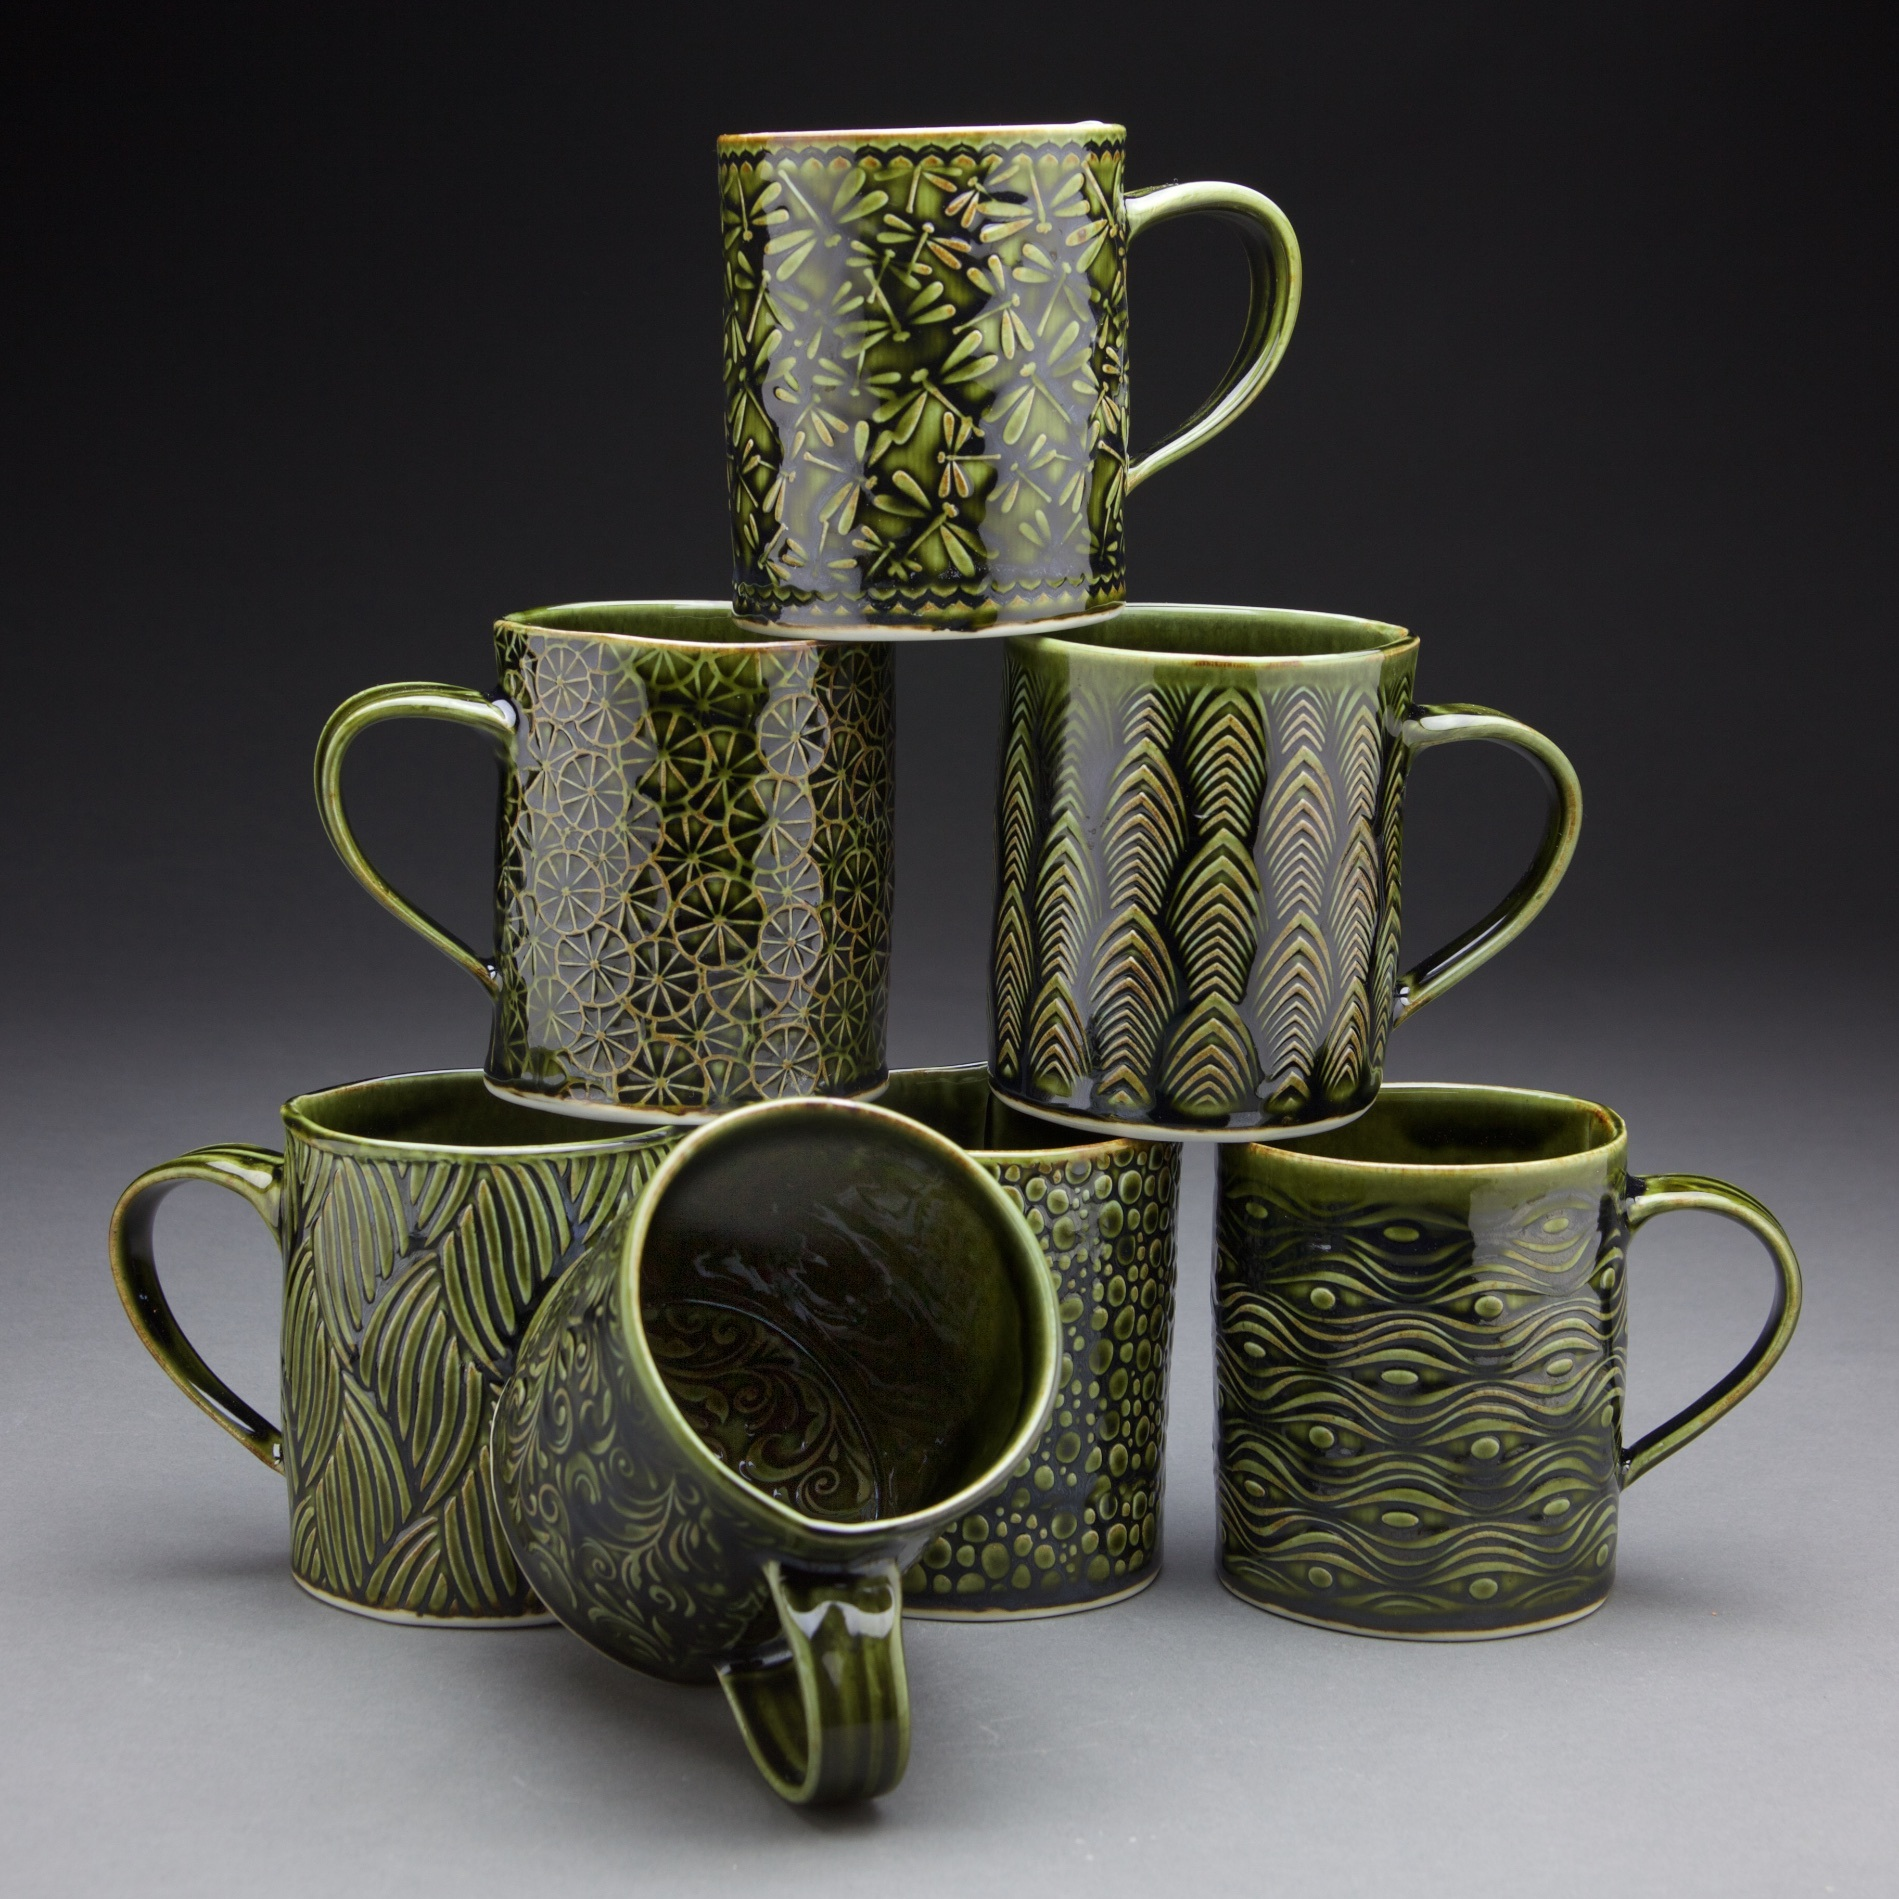 16 oz. mugs 3.5x3.5x4 in. Forest Green glaze